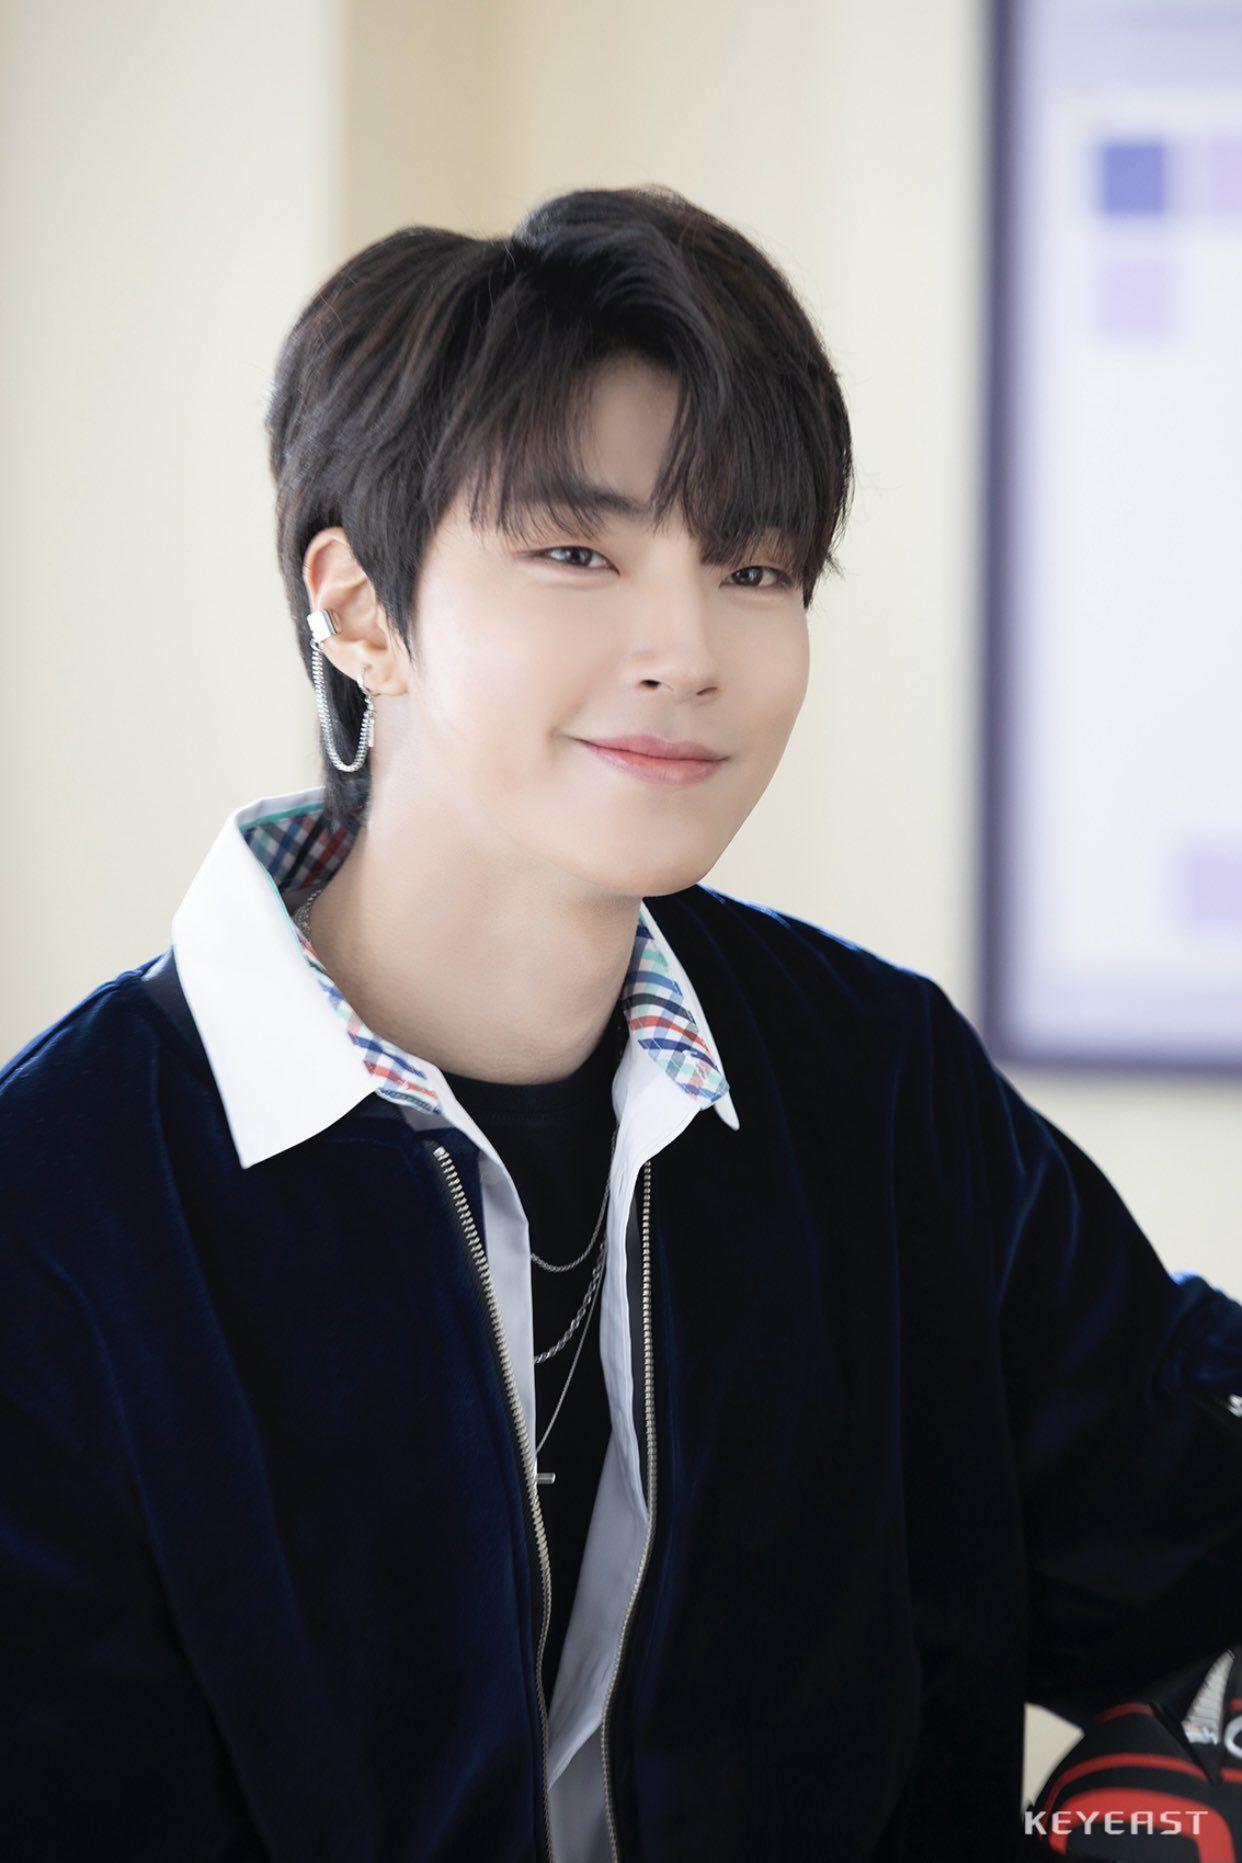 Ili Lillili Illi On Twitter In 2021 True Beauty Handsome Korean Actors Handsome Actors